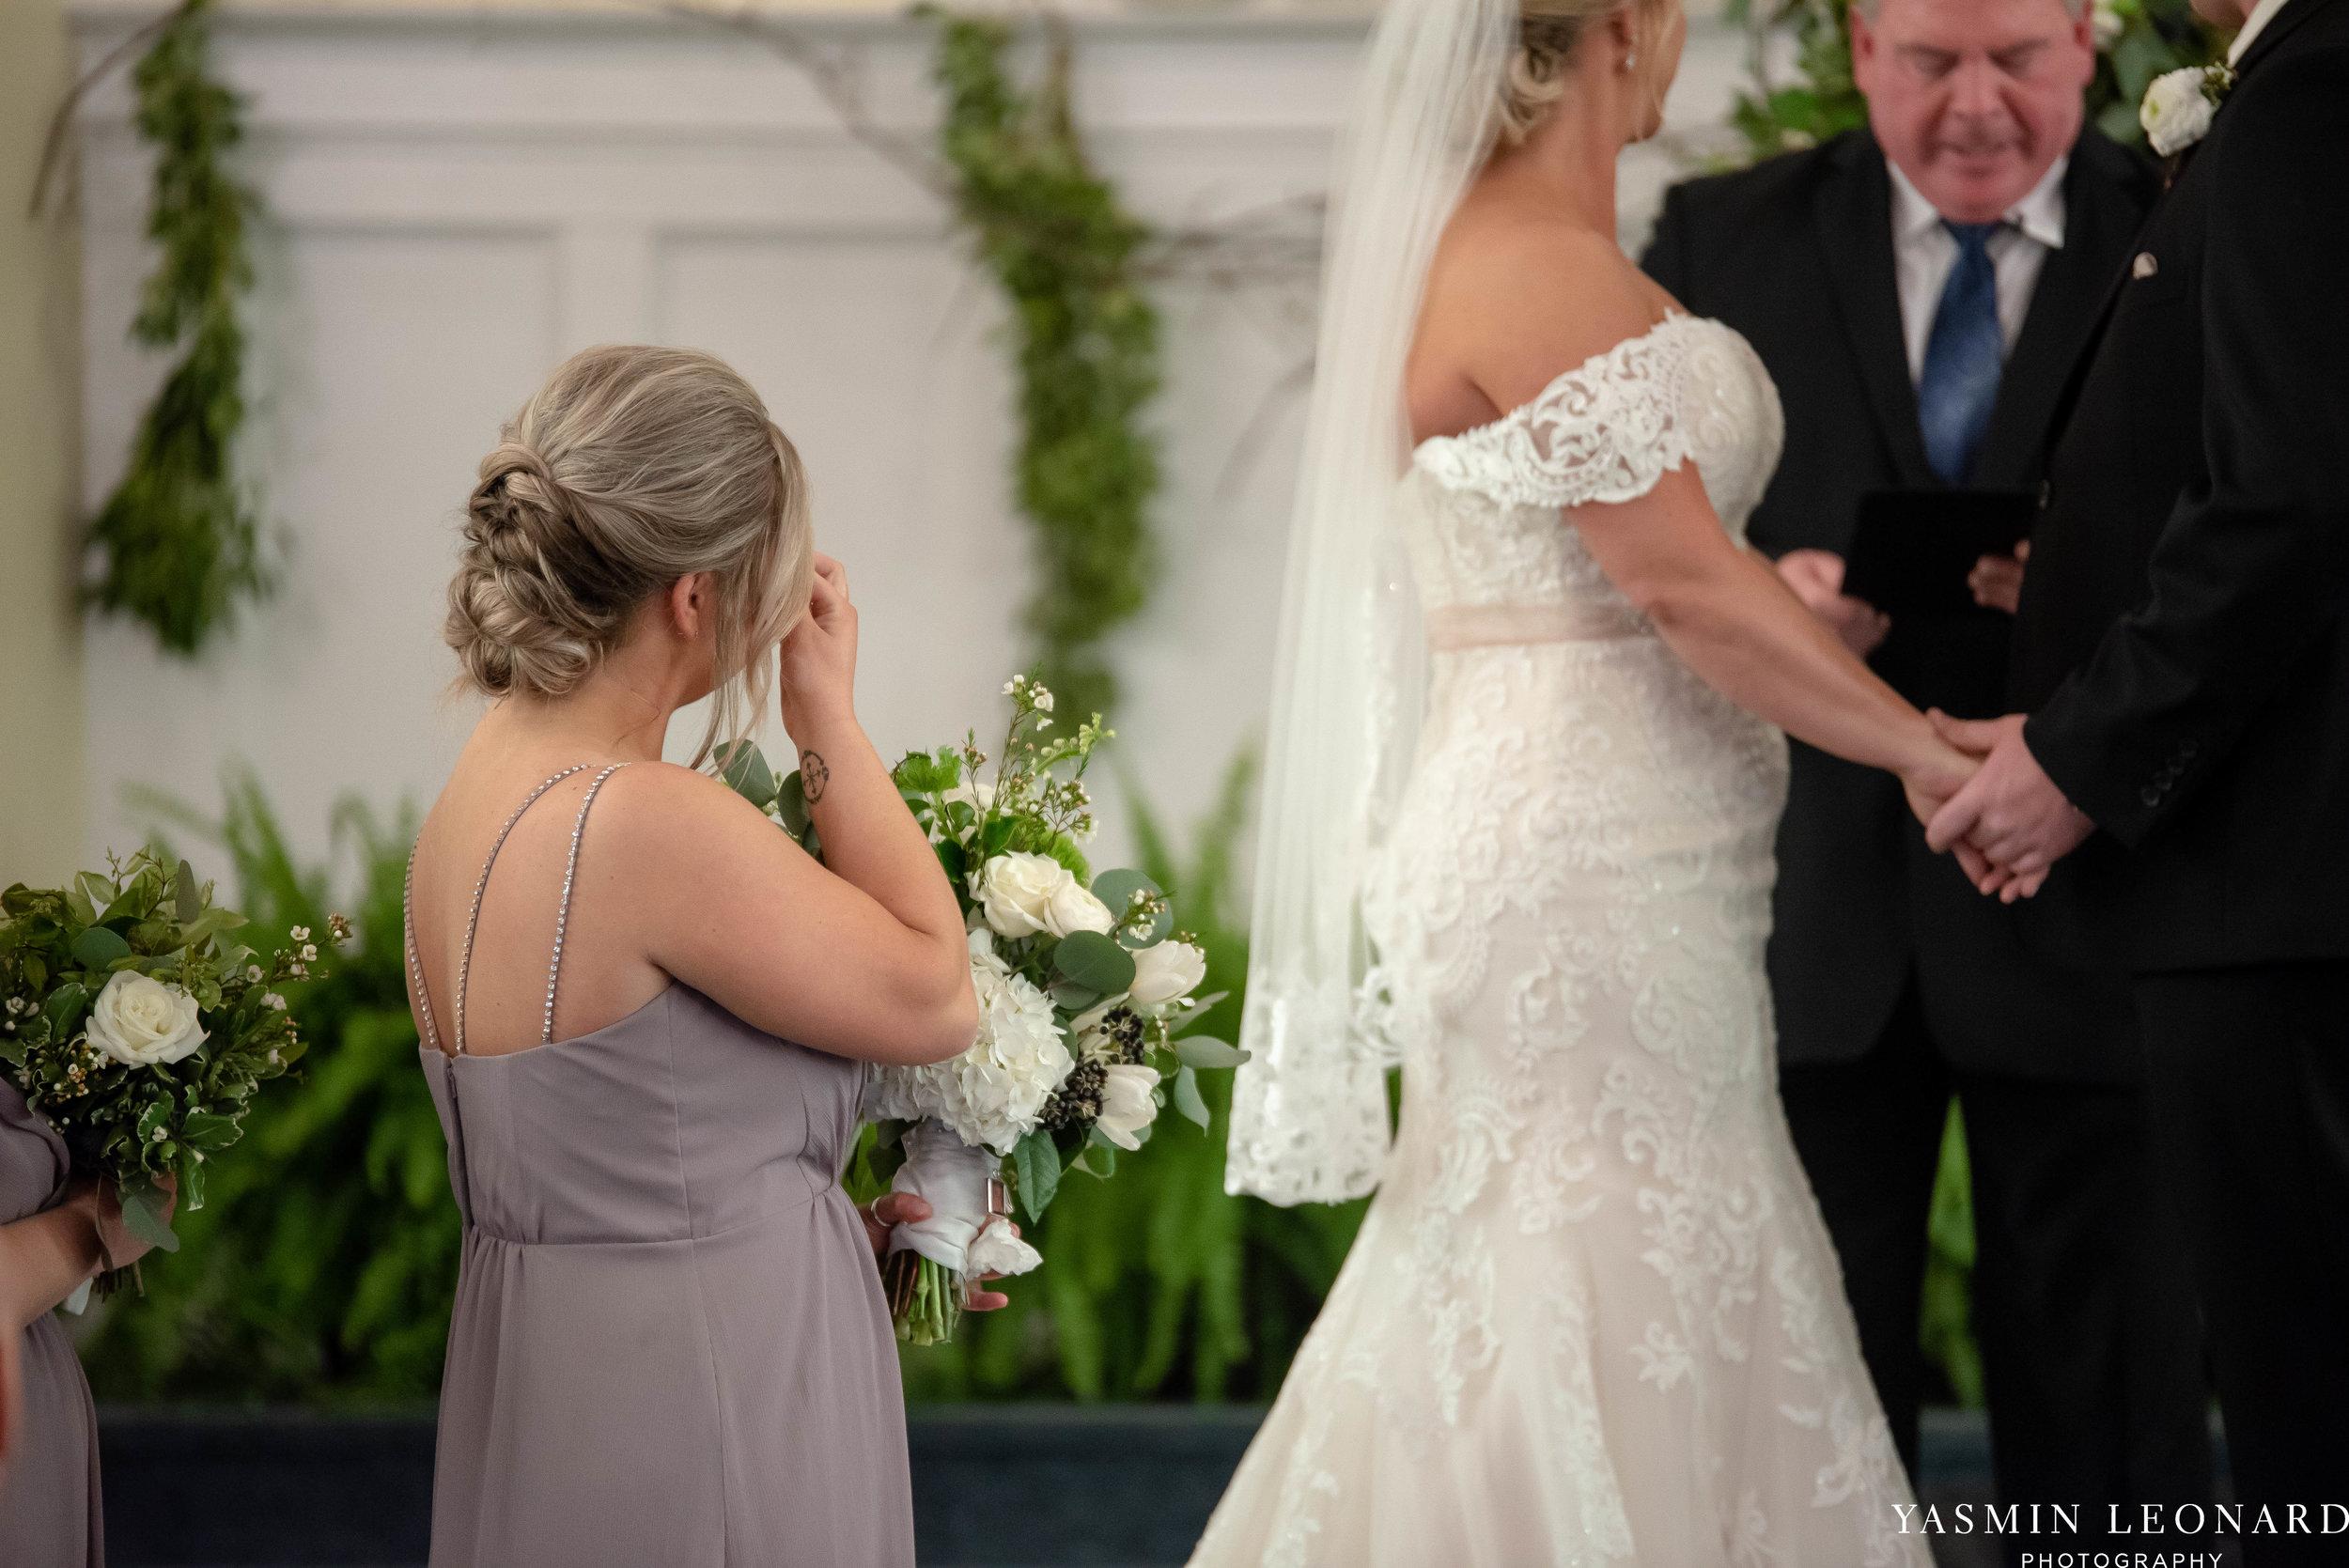 Carolina Beach Wedding - Fort Fisher Wedding - NC Acquarium - Beach Wedding - NC Wedding - Beach Wedding Inspiration - Beach Bride-19.jpg